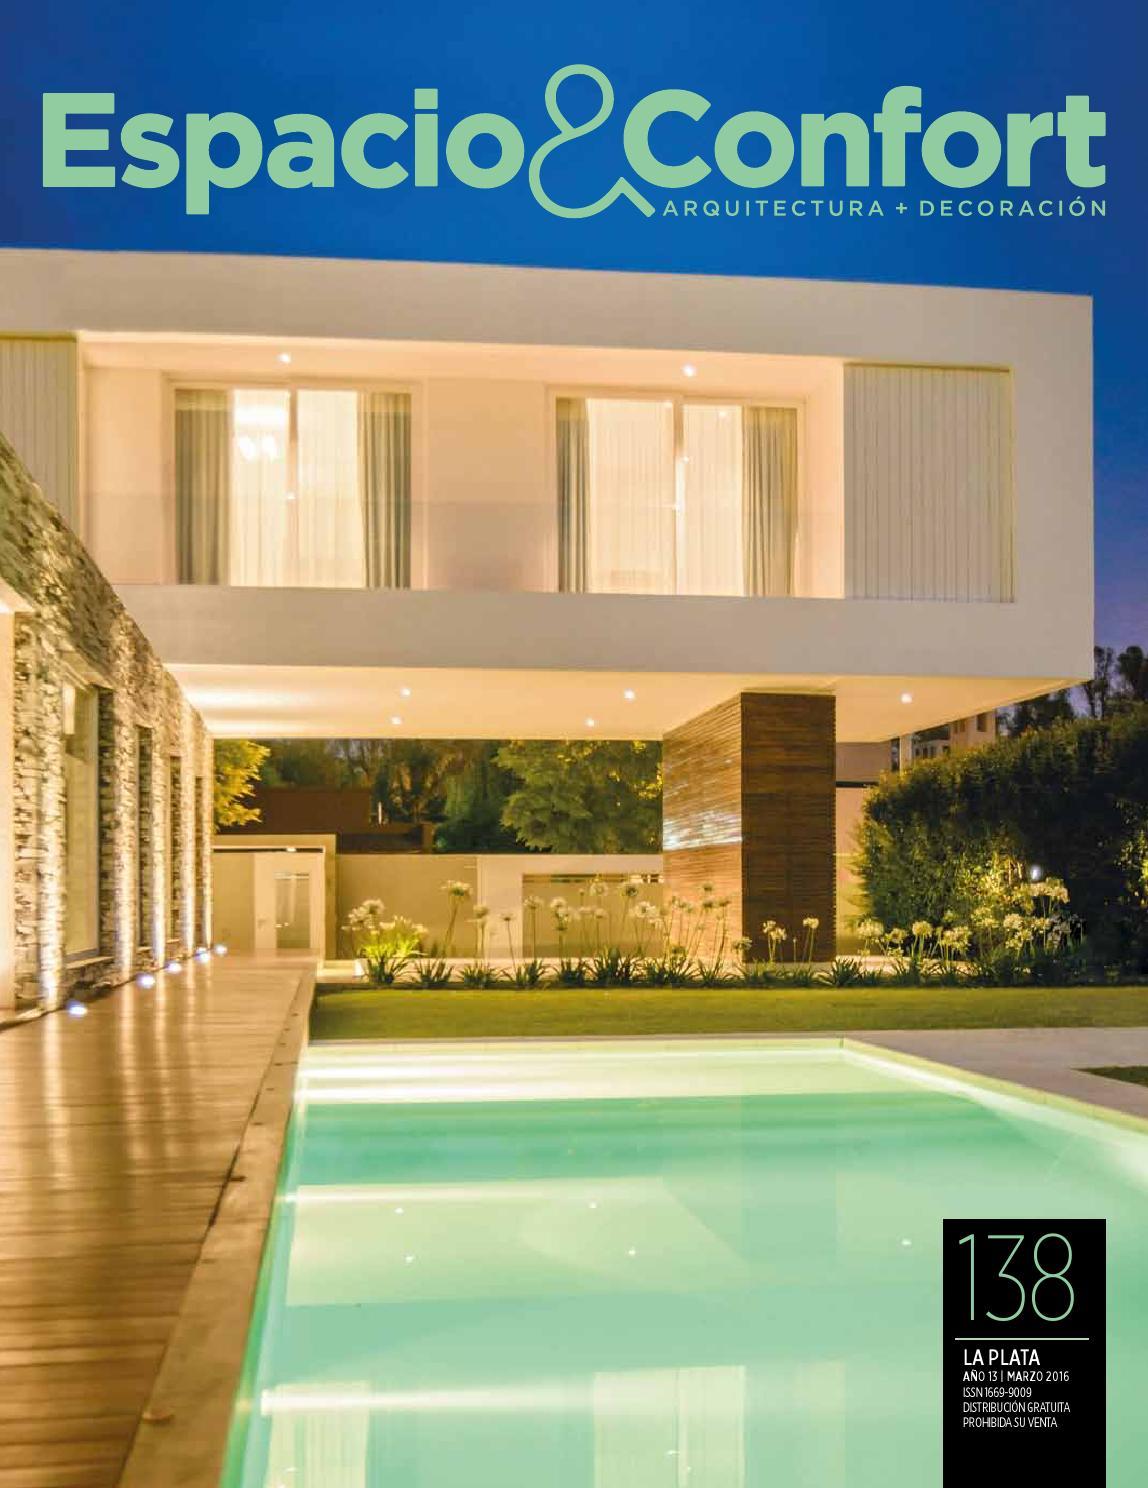 138 La Plata Marzo 16 By Revista Espacio Confort Arquitectura  # Petit Muebles Haedo